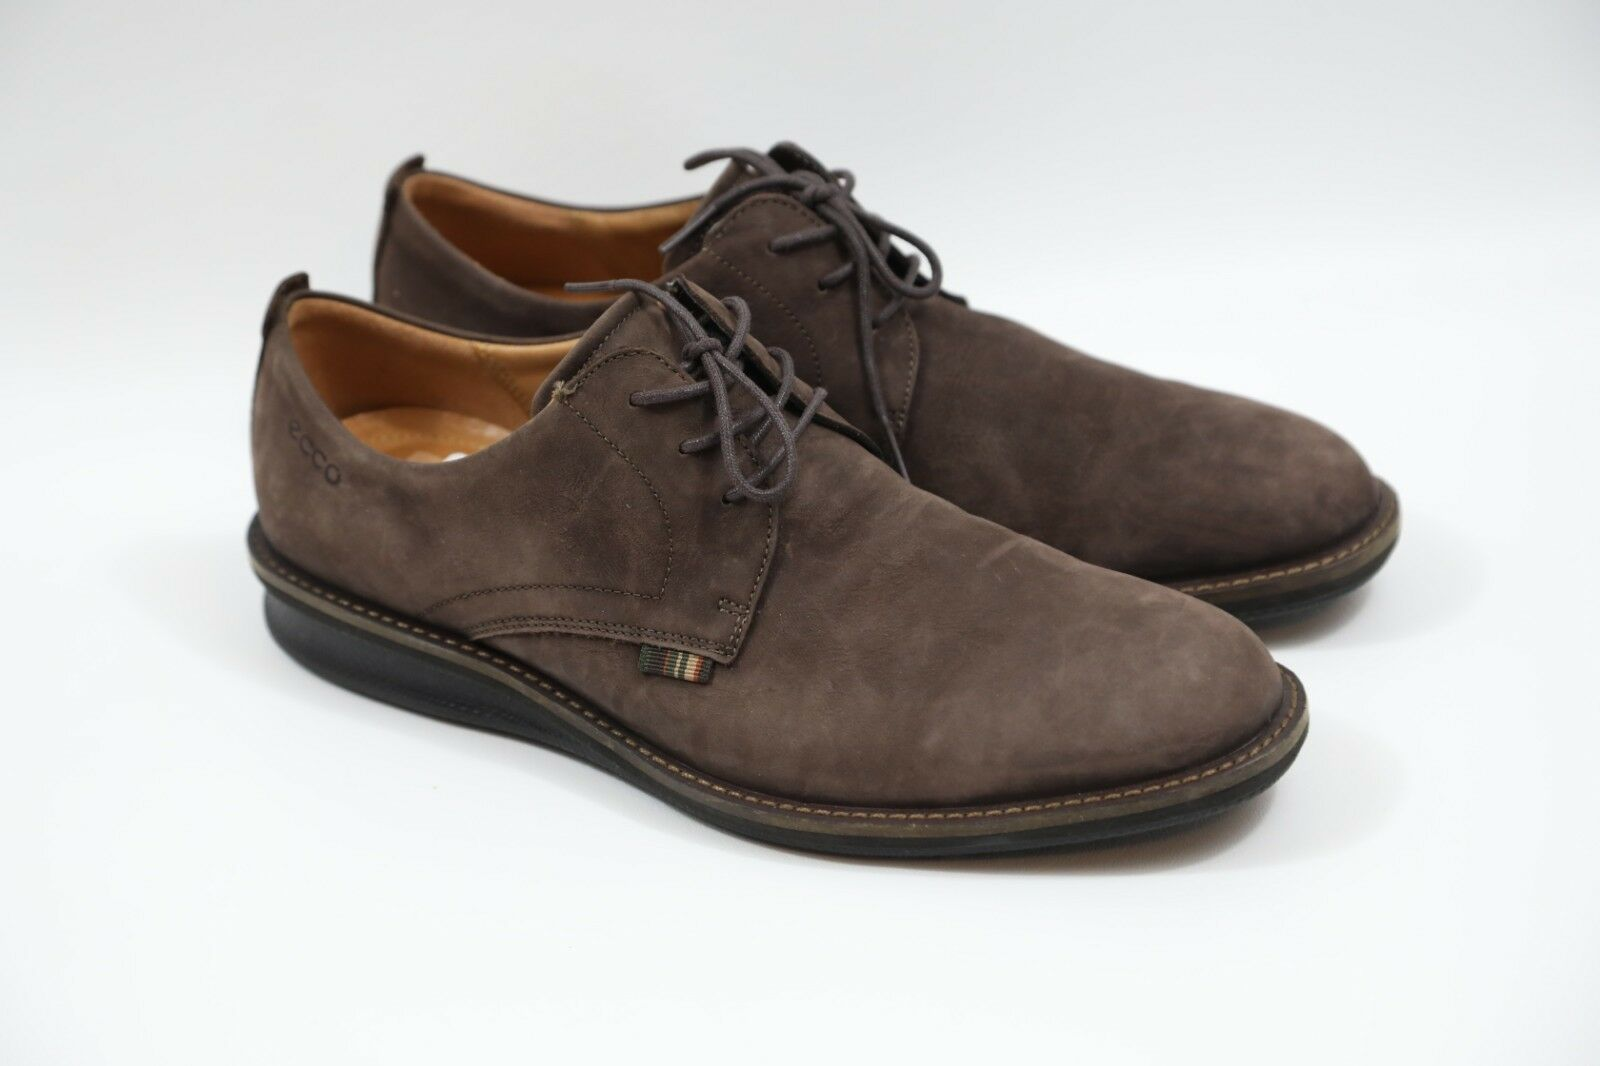 8245adf0c57 63 ECCO Brown Leather Size 43 Oxfords nogtgo142-Men's Casual - bota ...